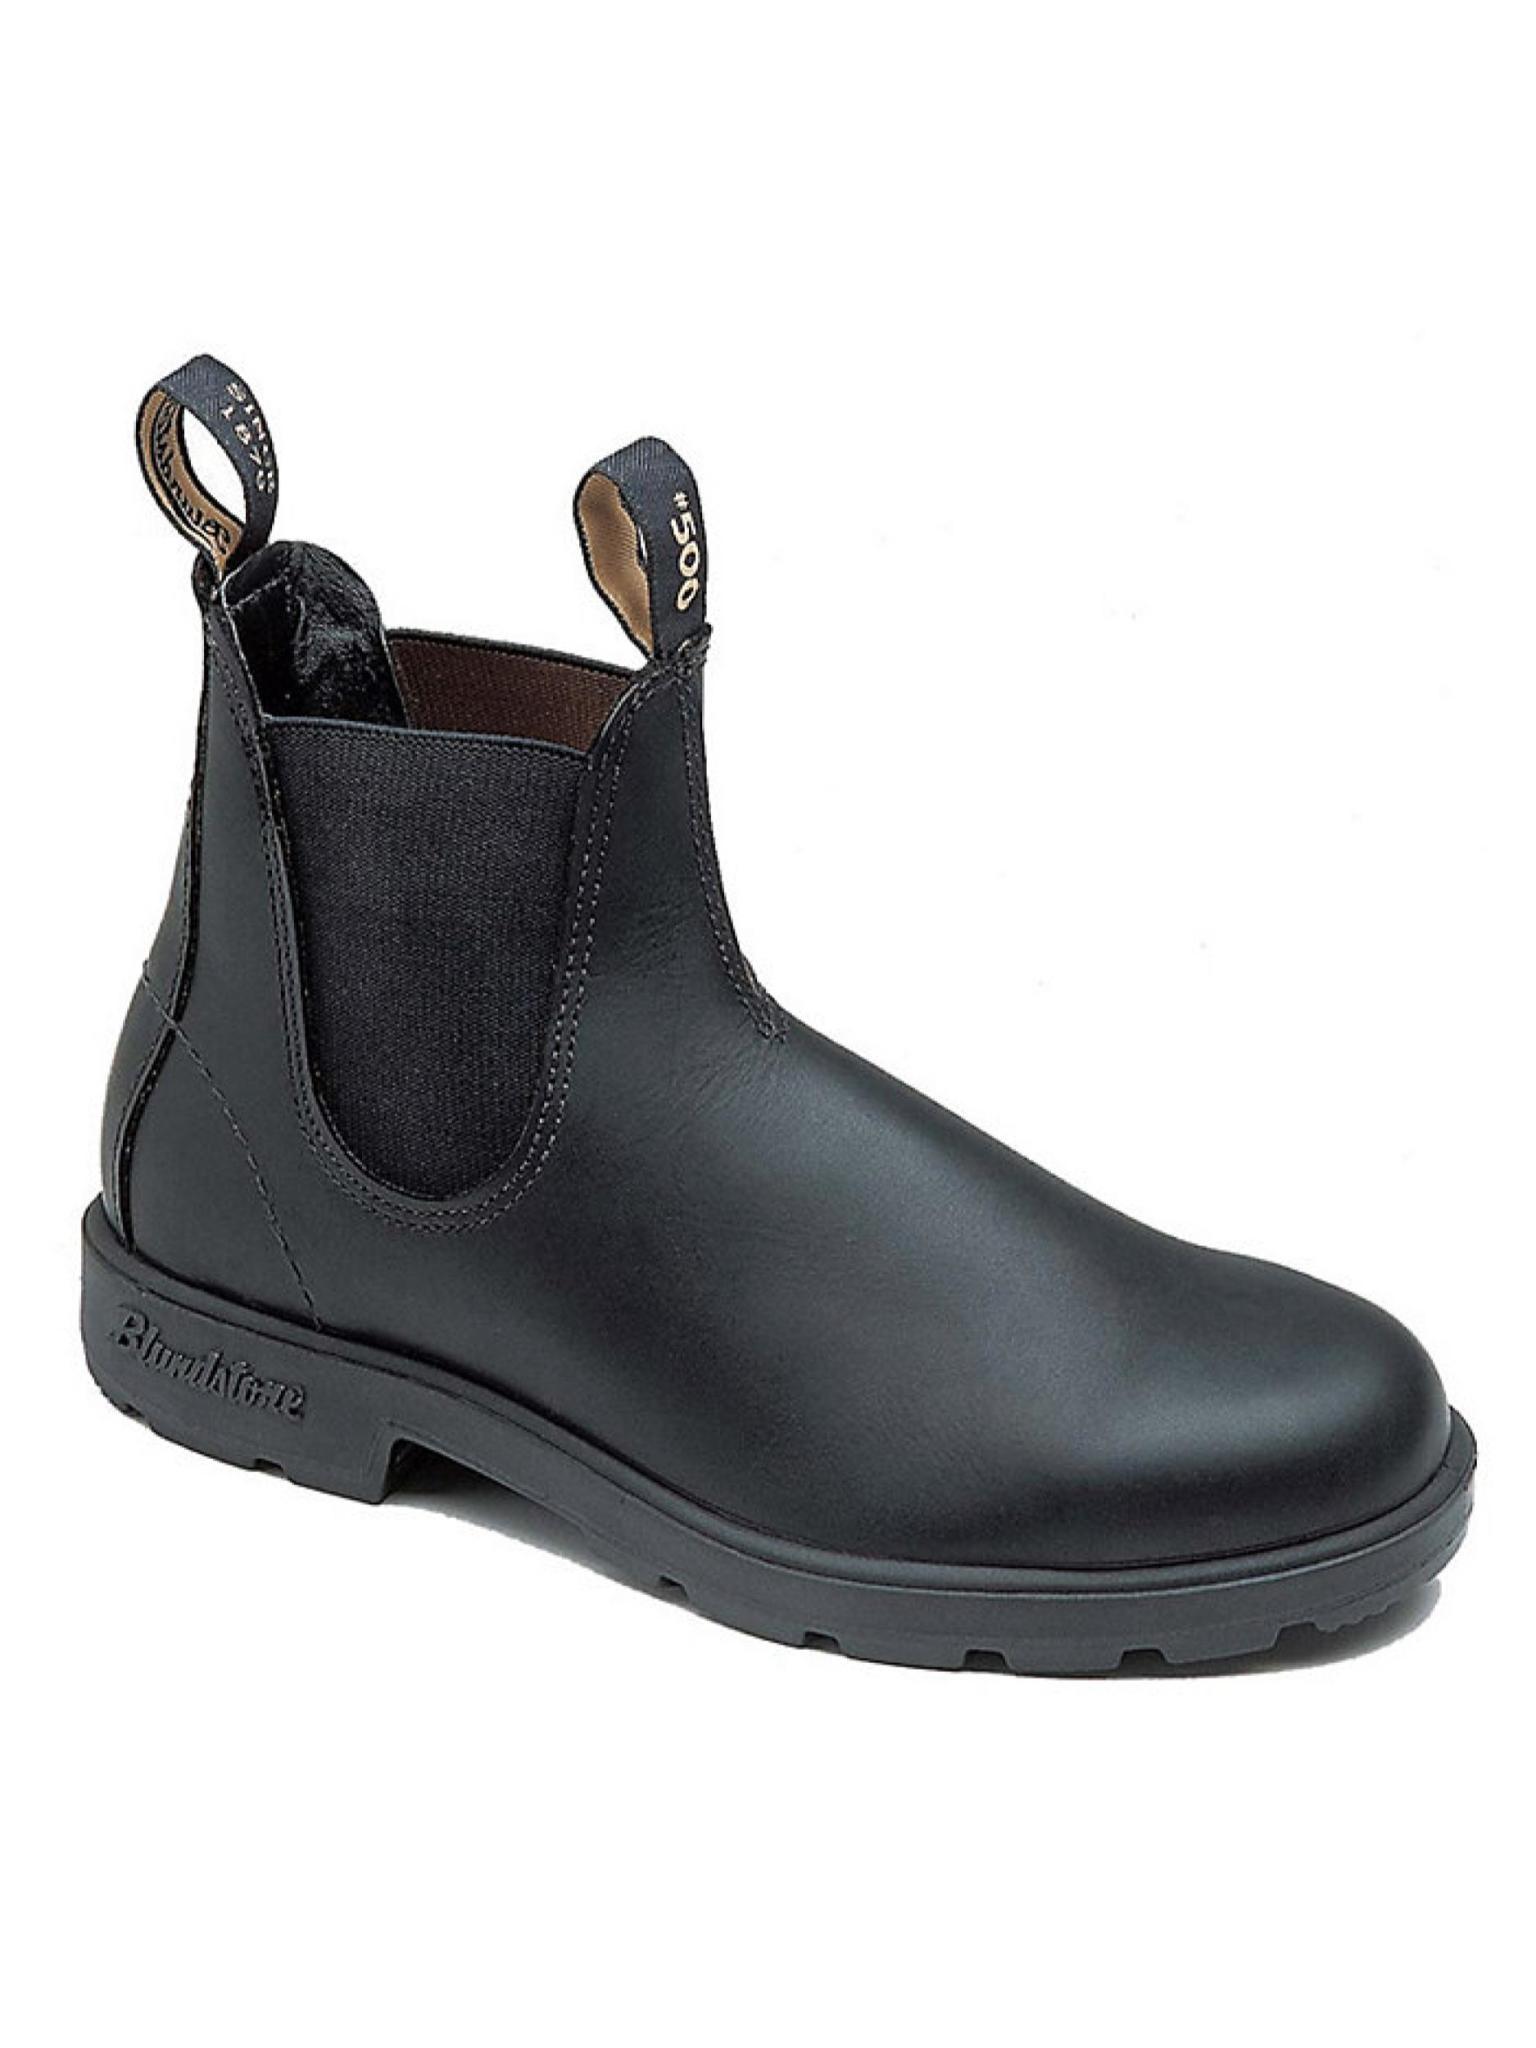 Blundstone Women's Original 510 Chelsea Boot